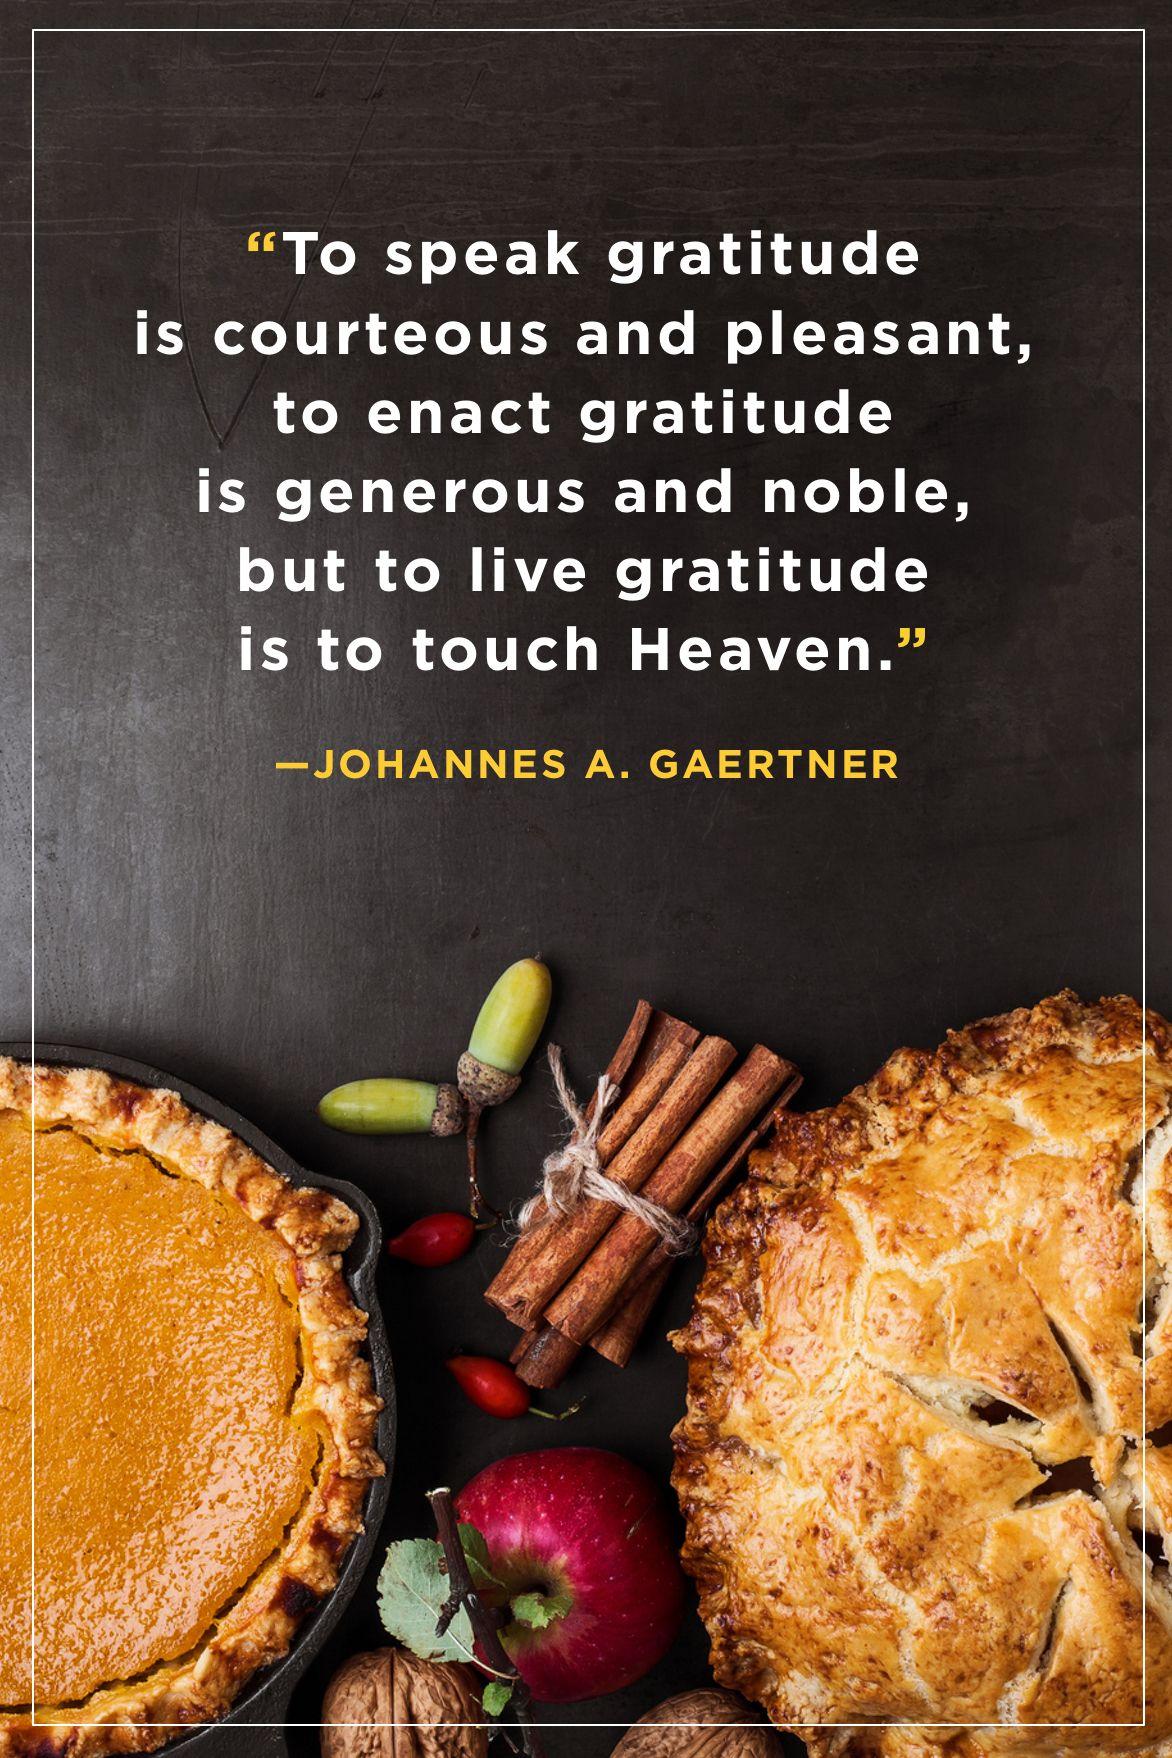 Johannes Gaertner Thanksgiving Quotes